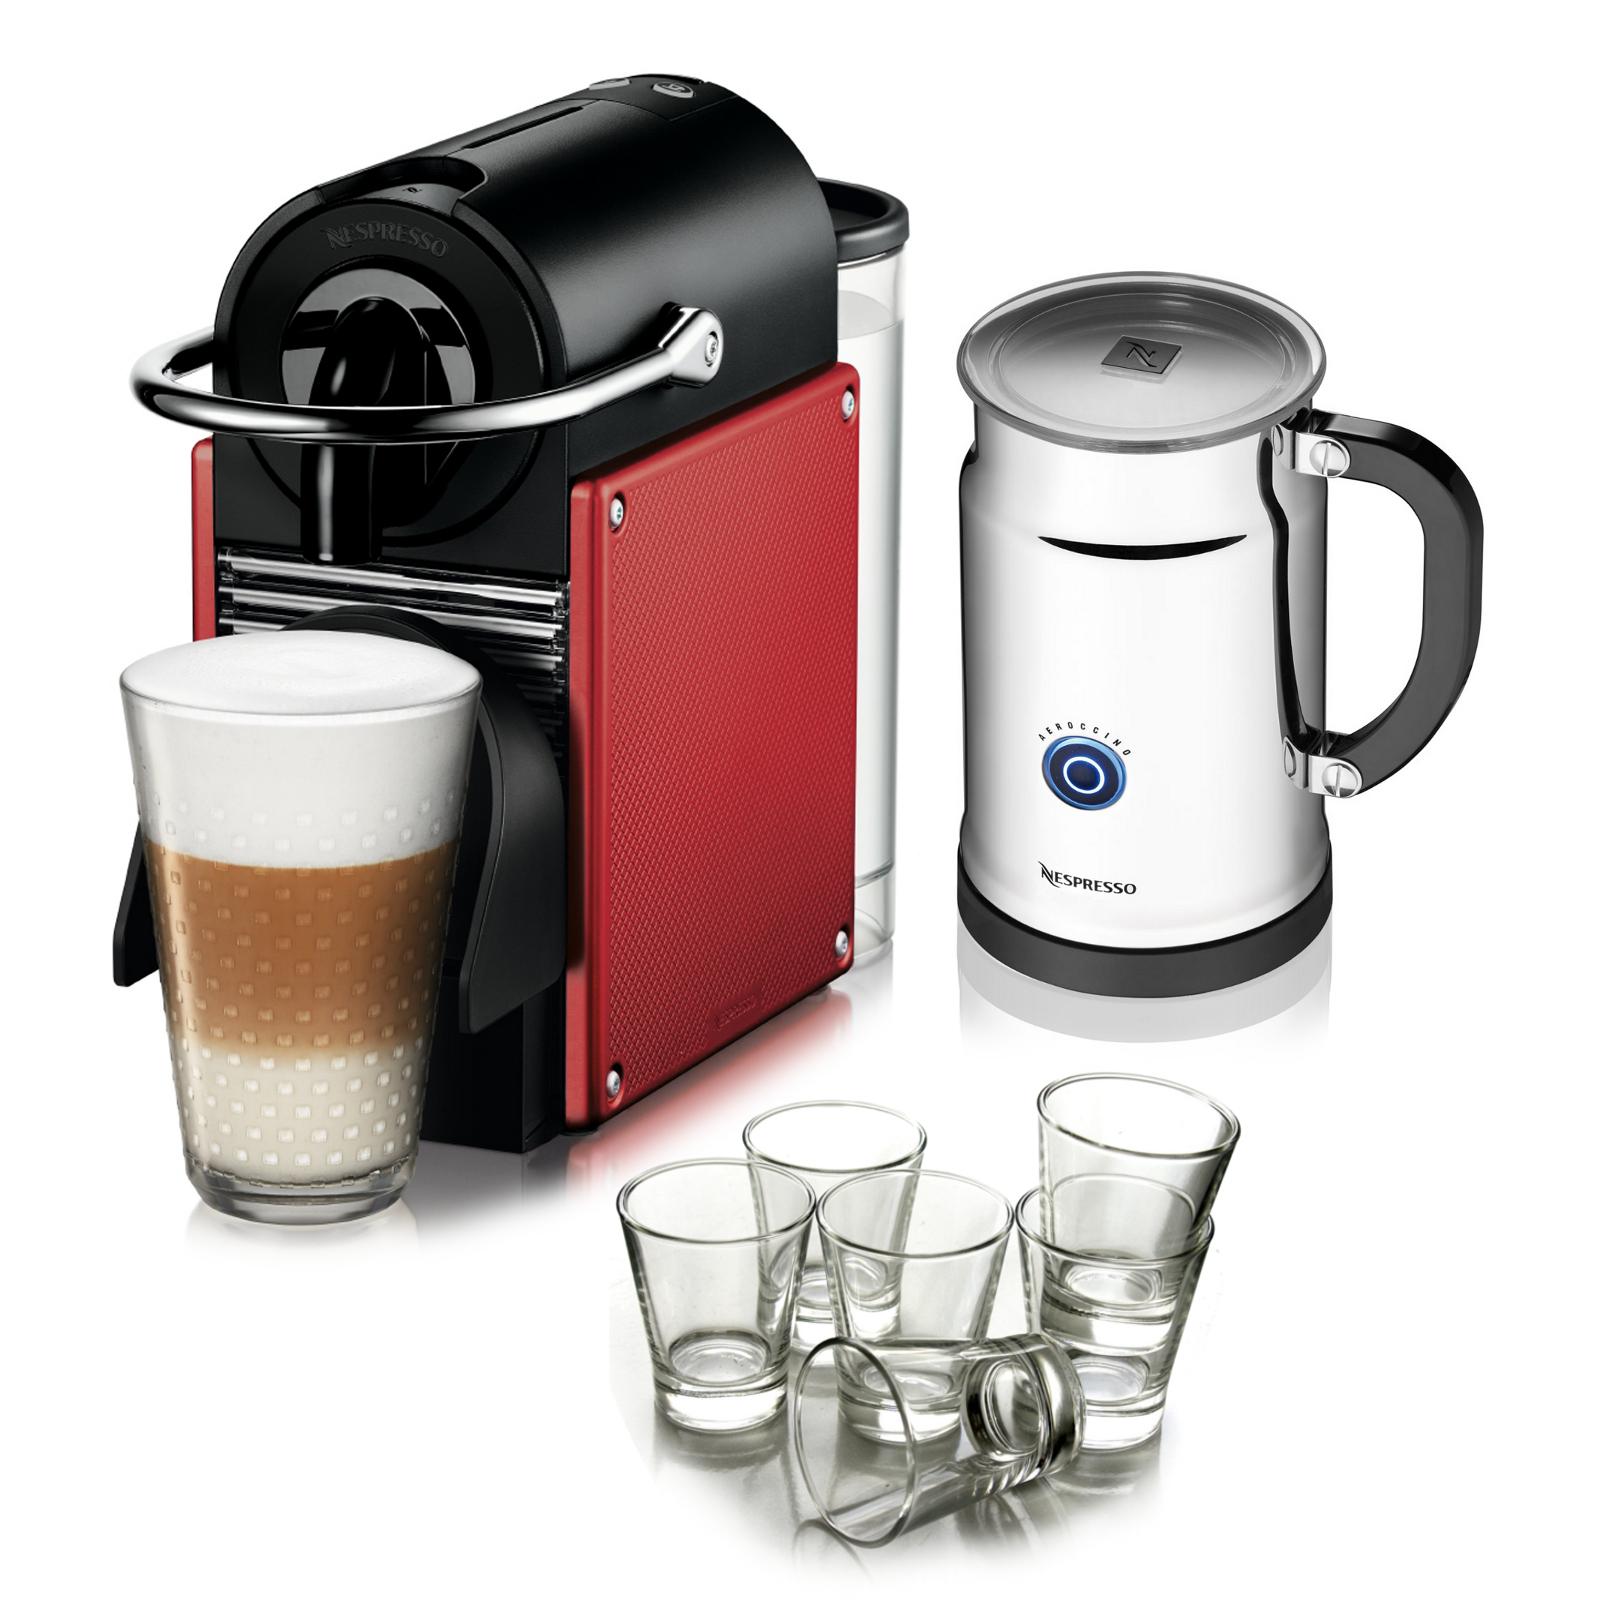 Nespresso Pixie D60 Dark Red Espresso Machine with Aeroccino Plus Milk Frother and Free Set of 6 Italian Espresso Glasses